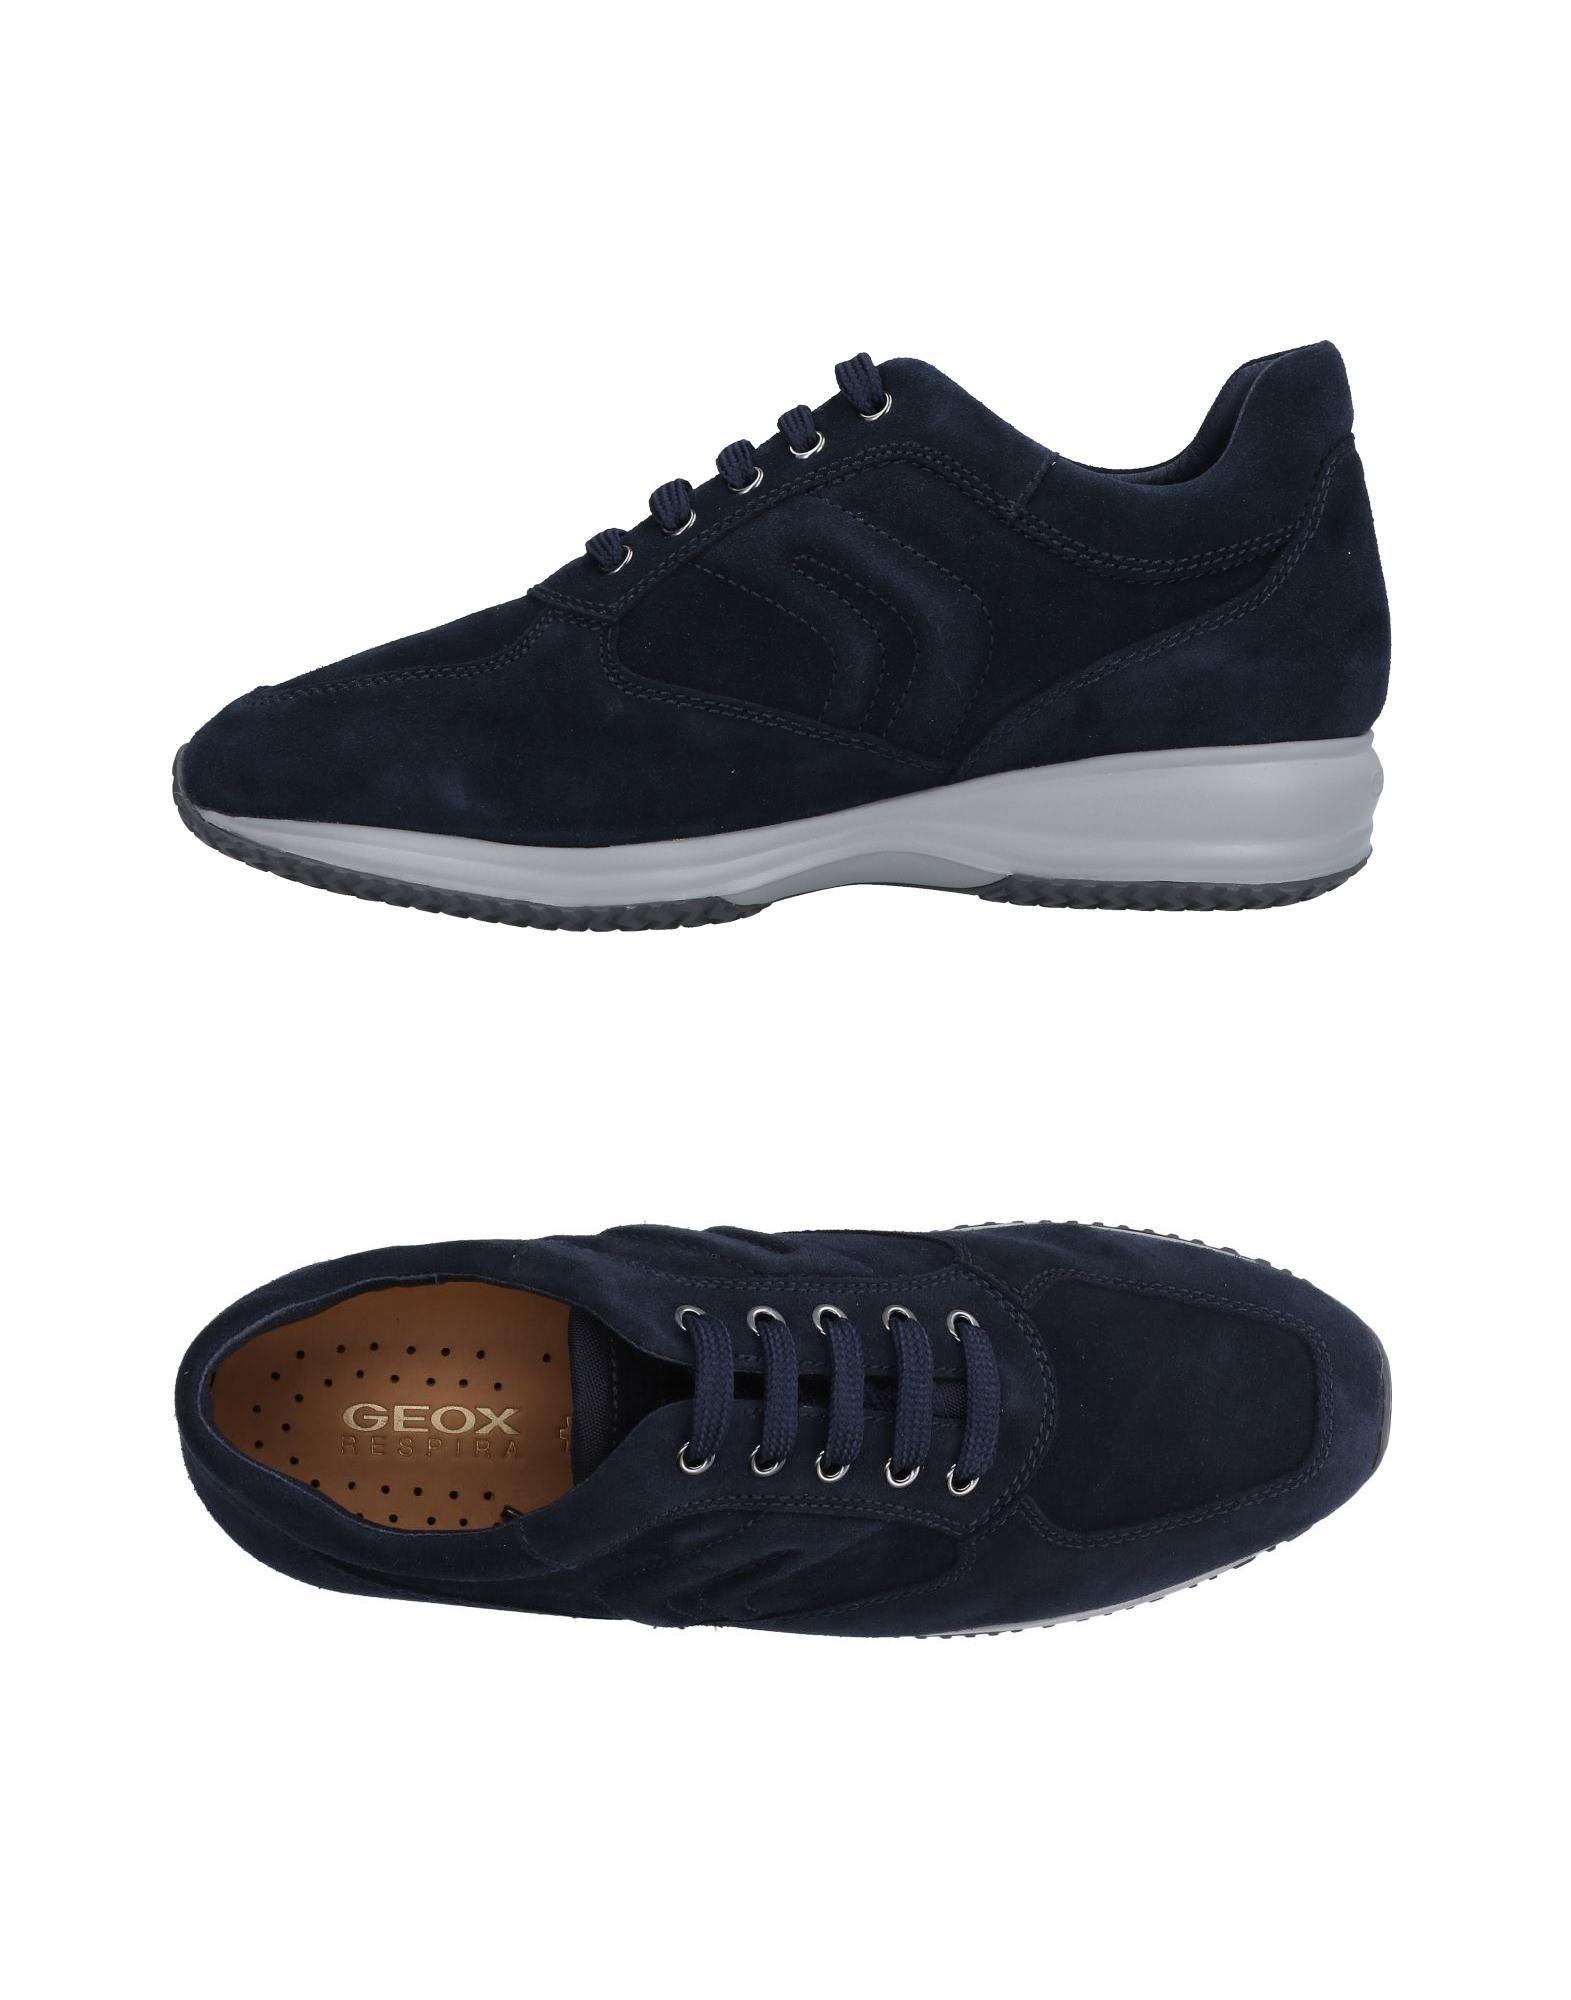 Geox Sneakers - Men Geox Sneakers online online online on  Australia - 11519894AW 6b0544